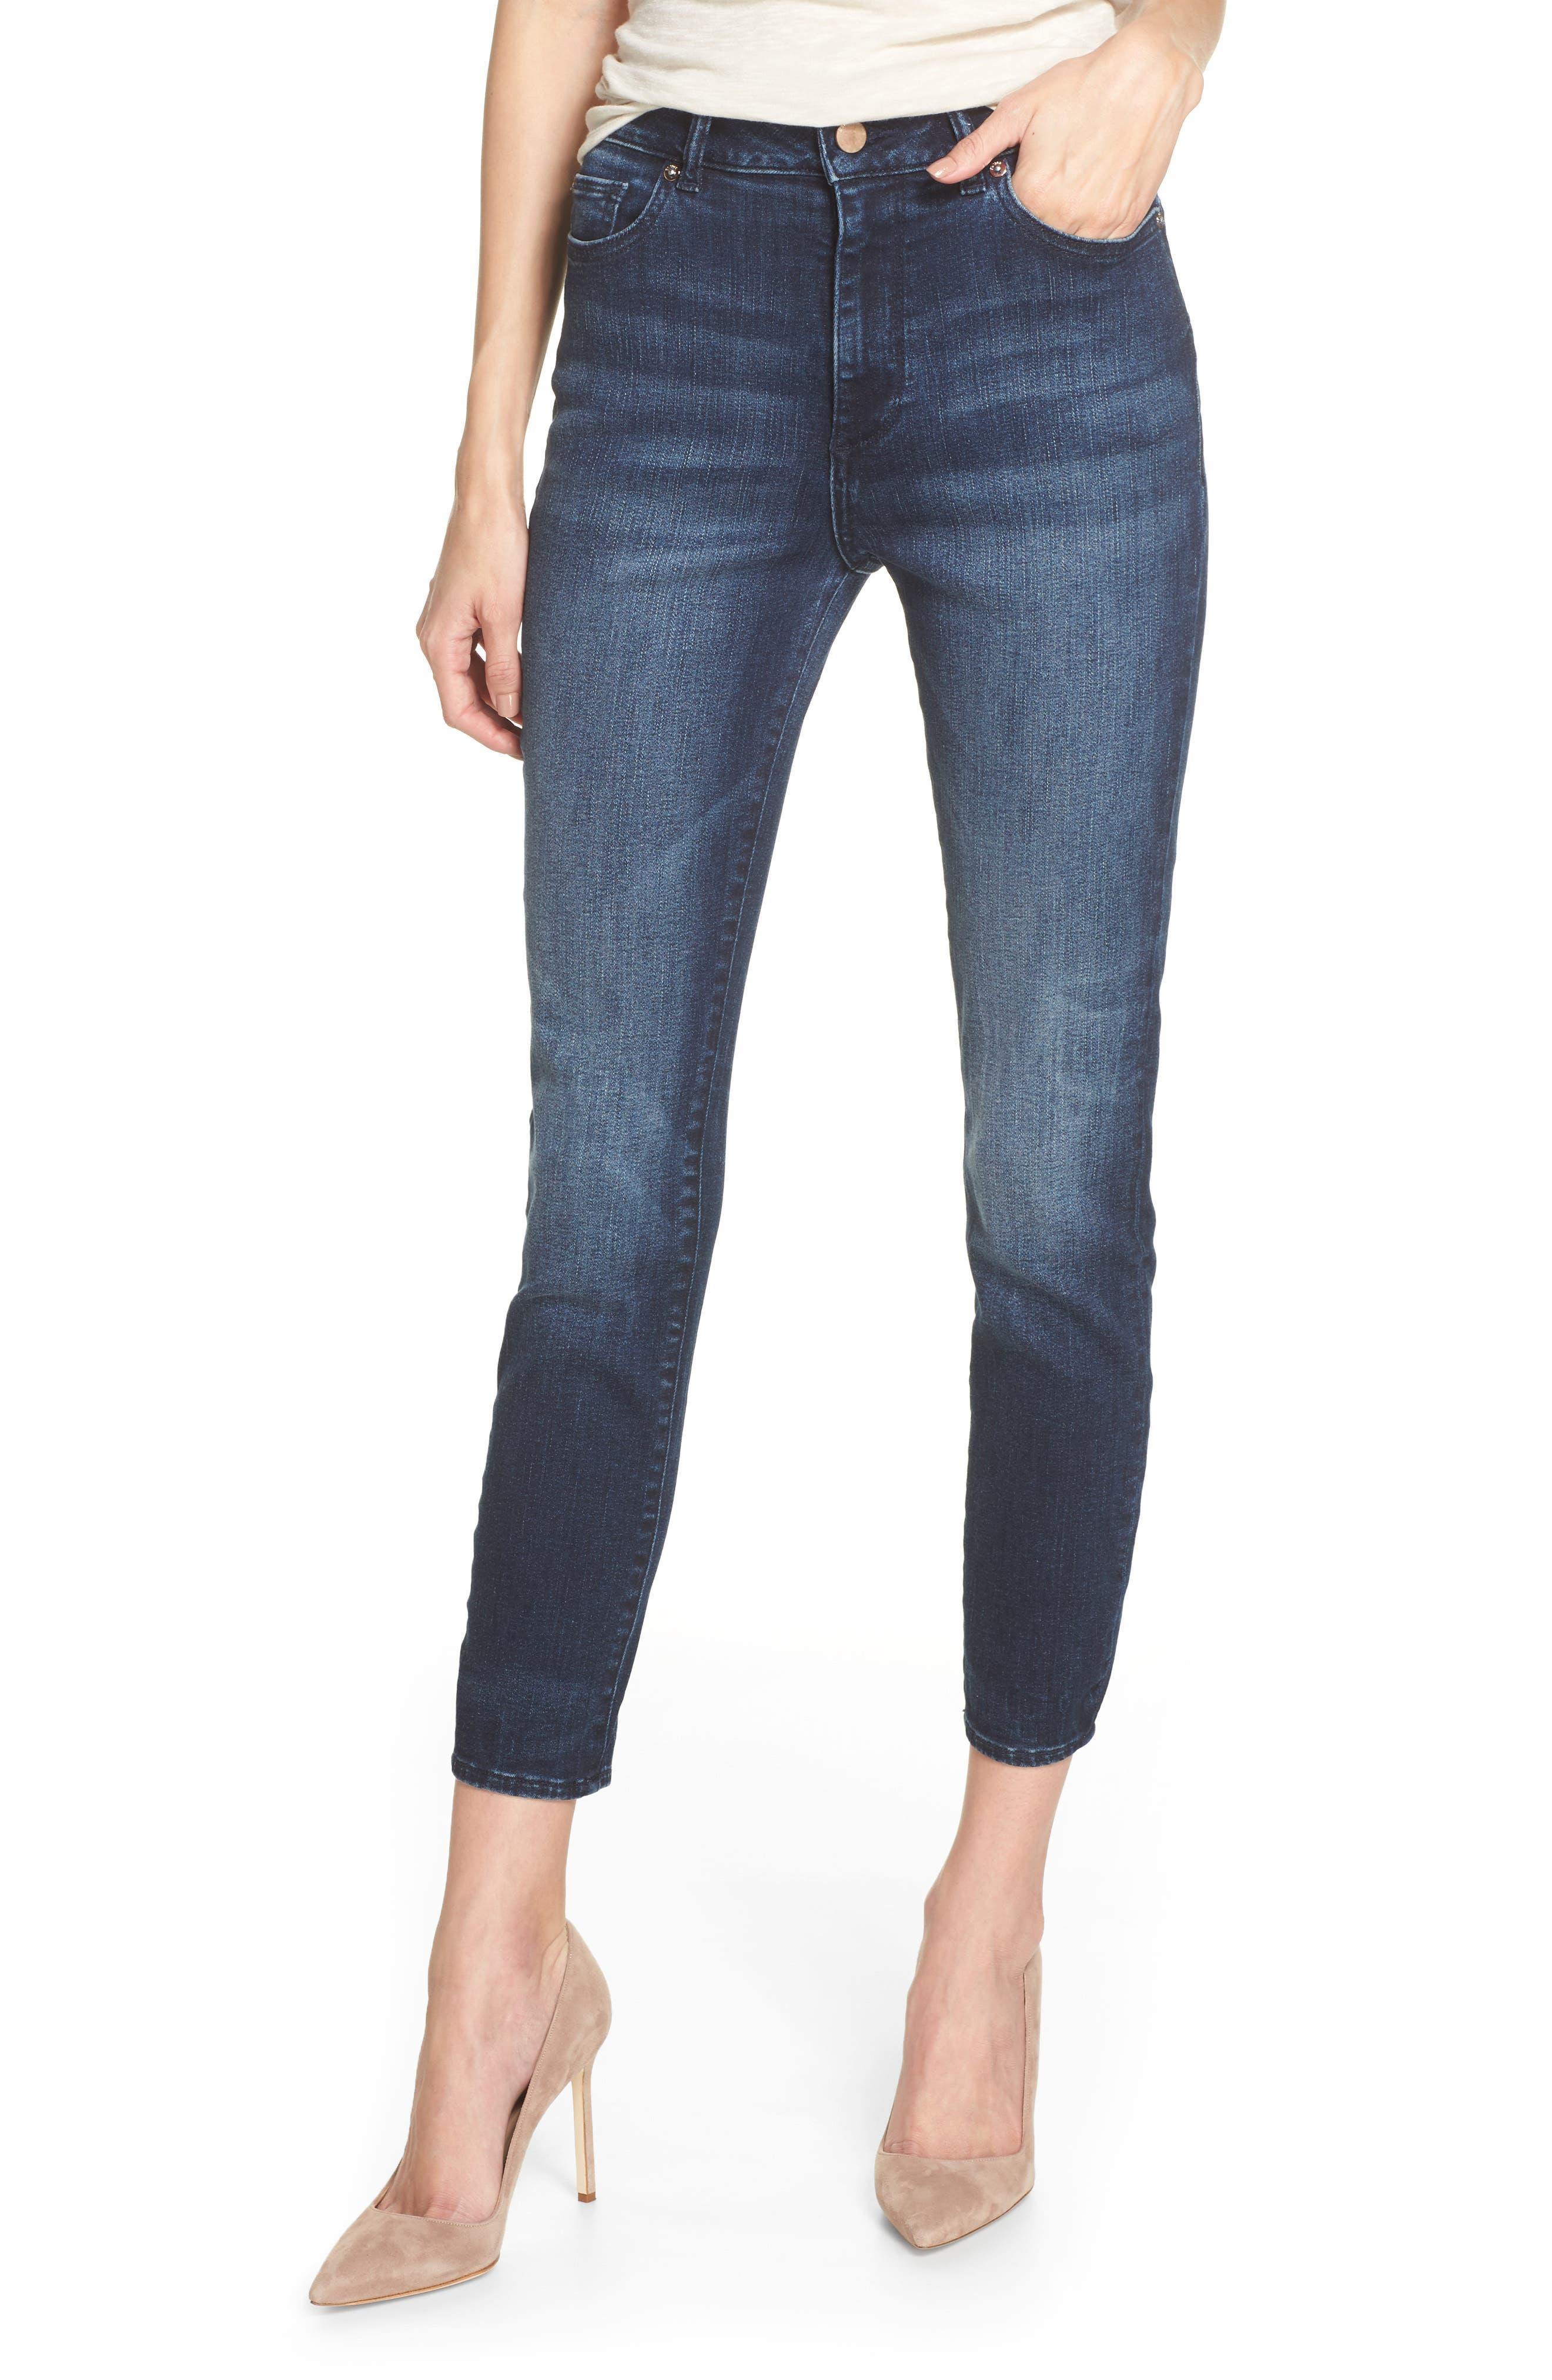 Main Image - DL1961 Chrissy High Waist Ankle Skinny Jeans (Daytona)